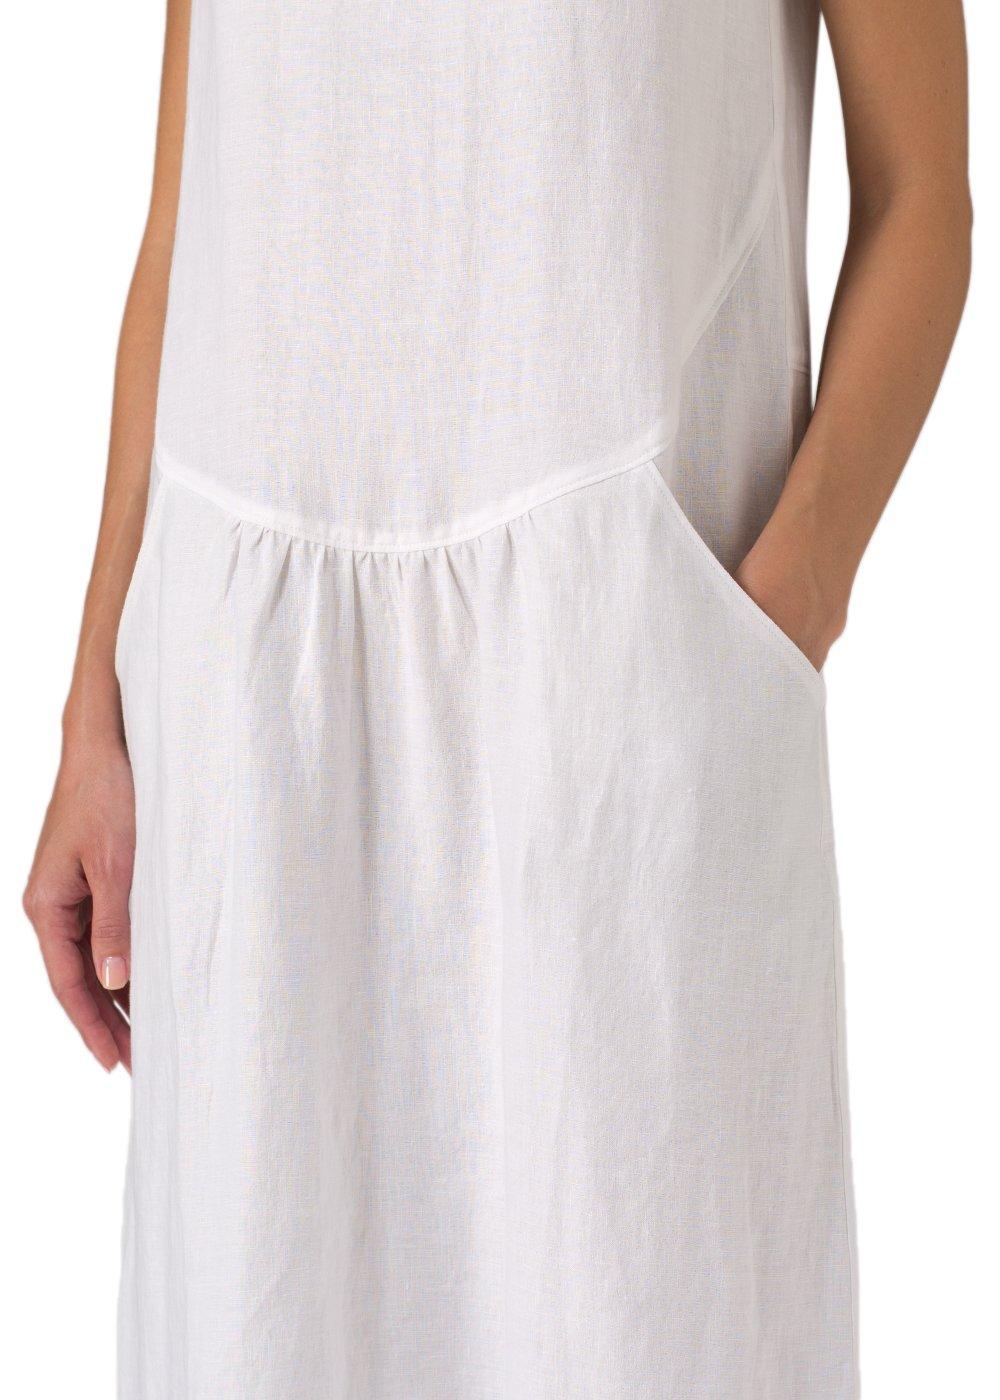 Vivid Linen Short Sleeve Dress-M-Soft White